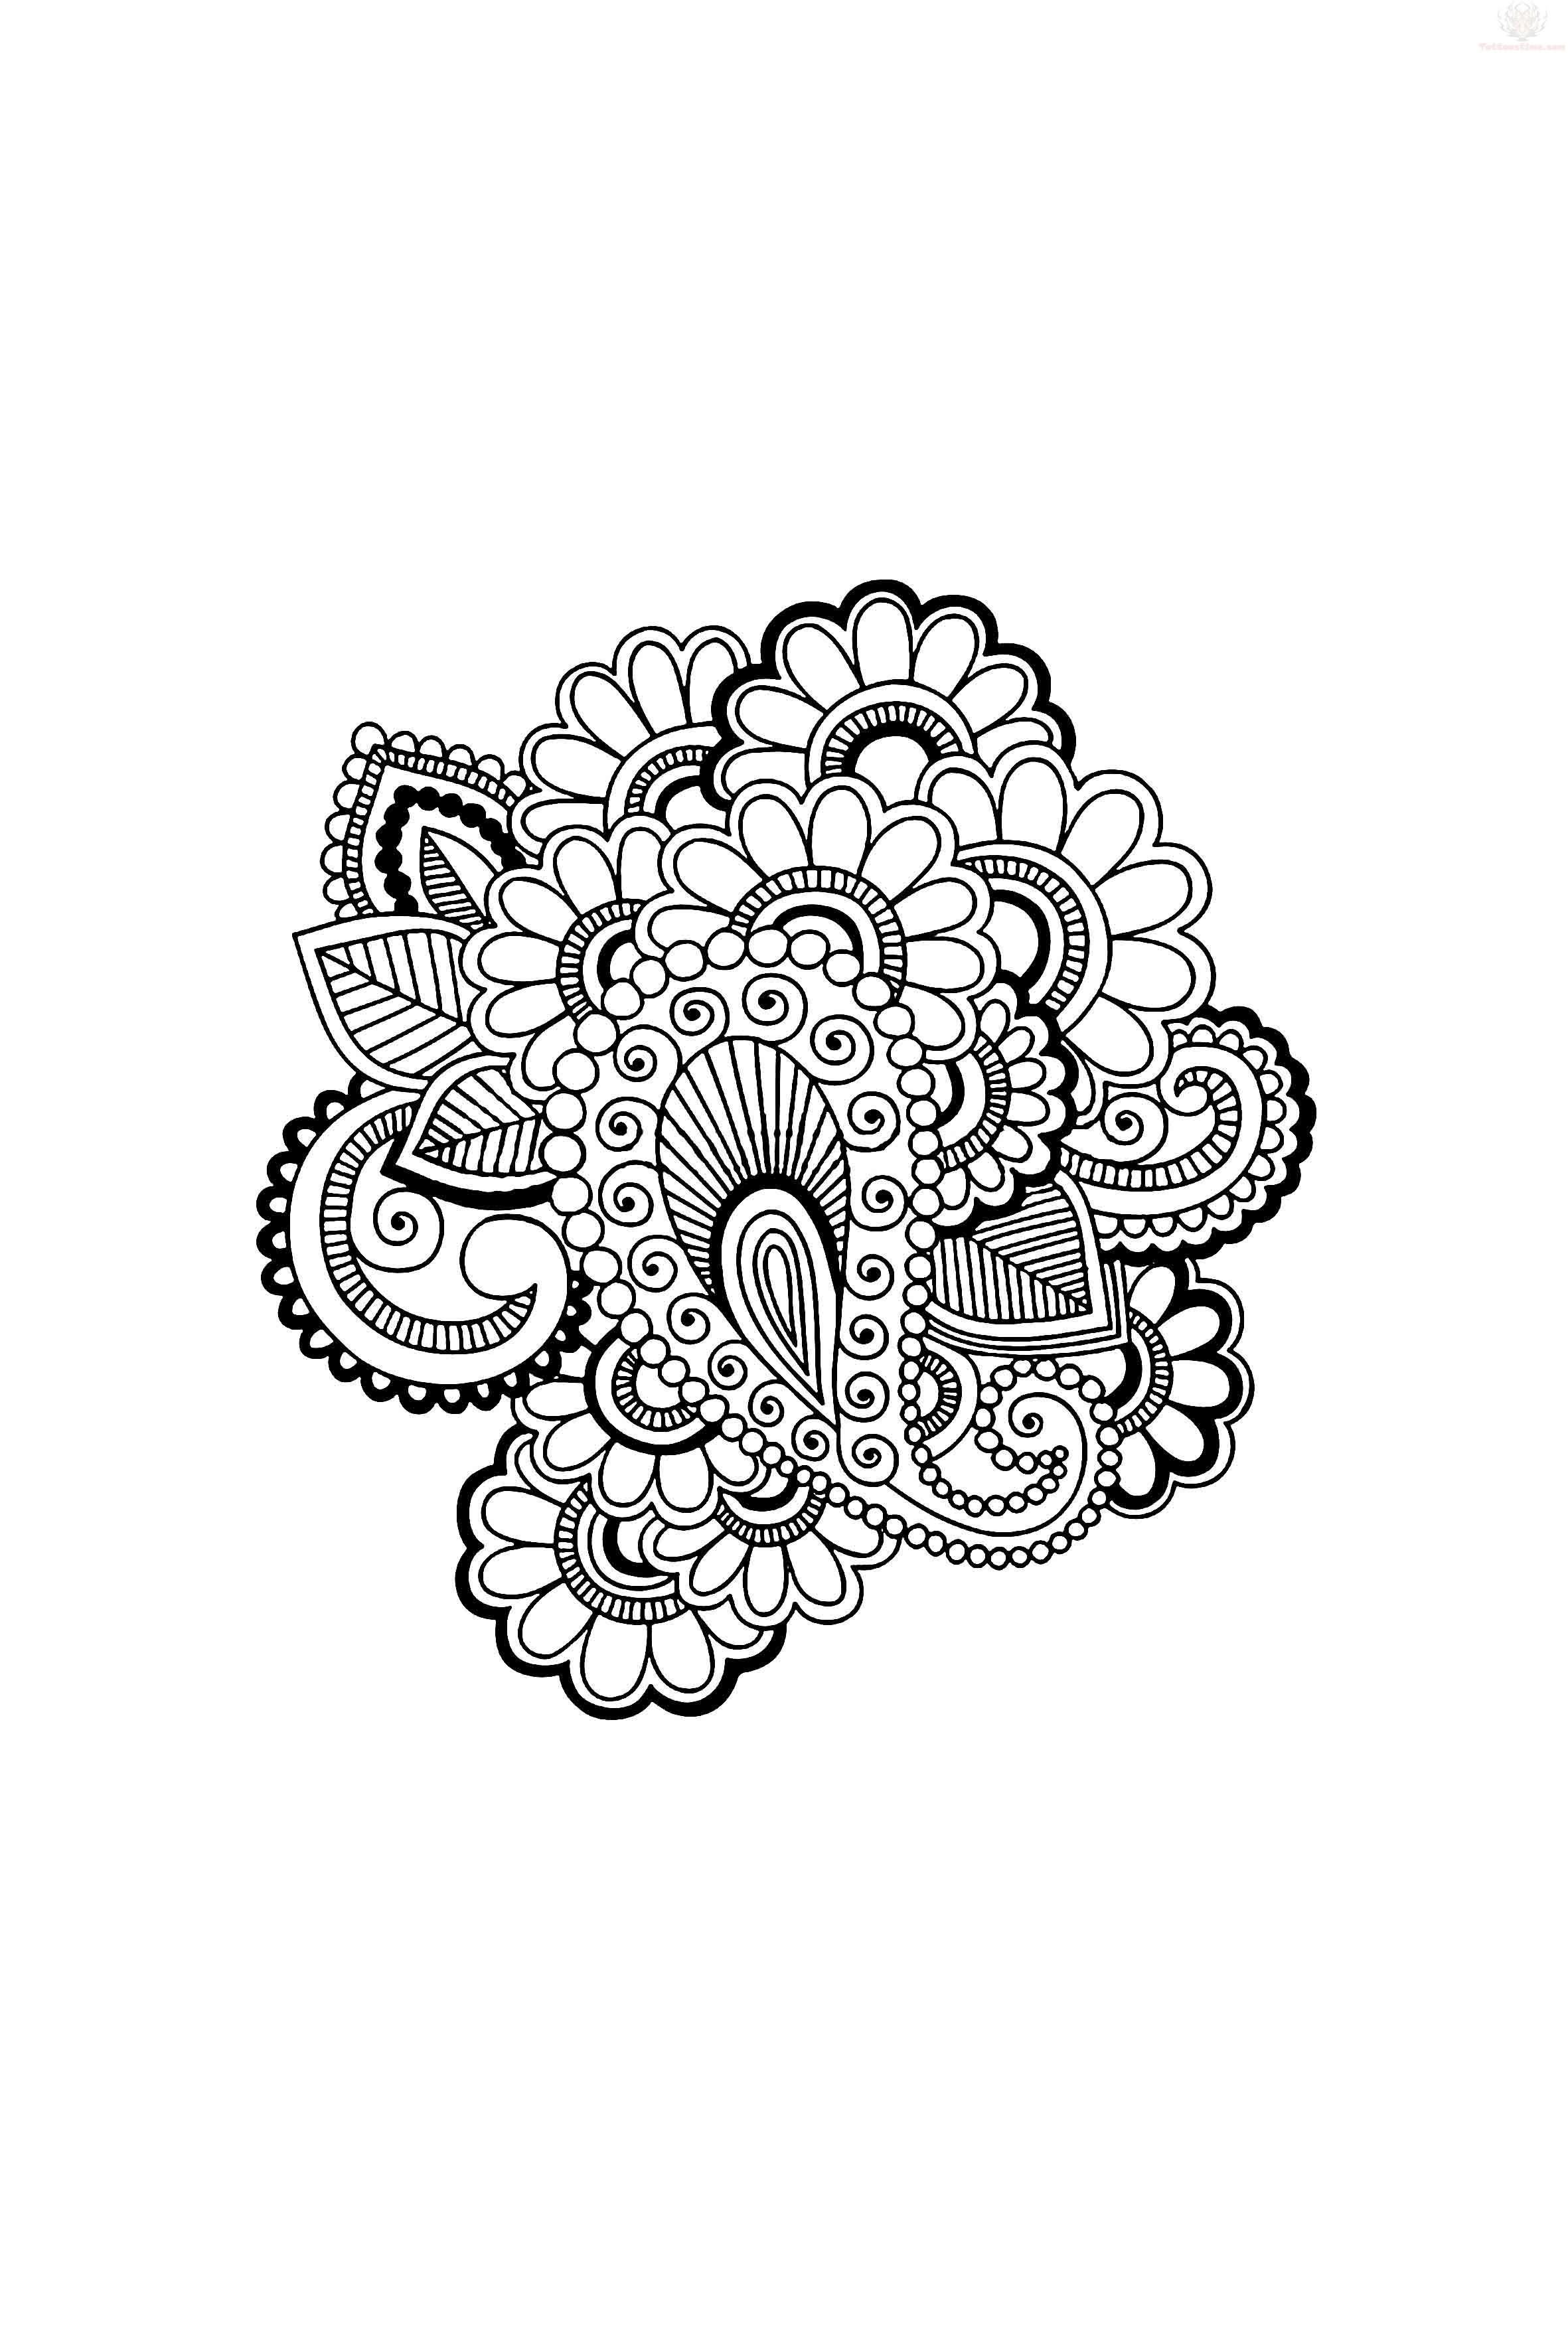 Mano-Drawn intrincadas Abstract Flowers Mehndi Henna Tattoo Paisley ...